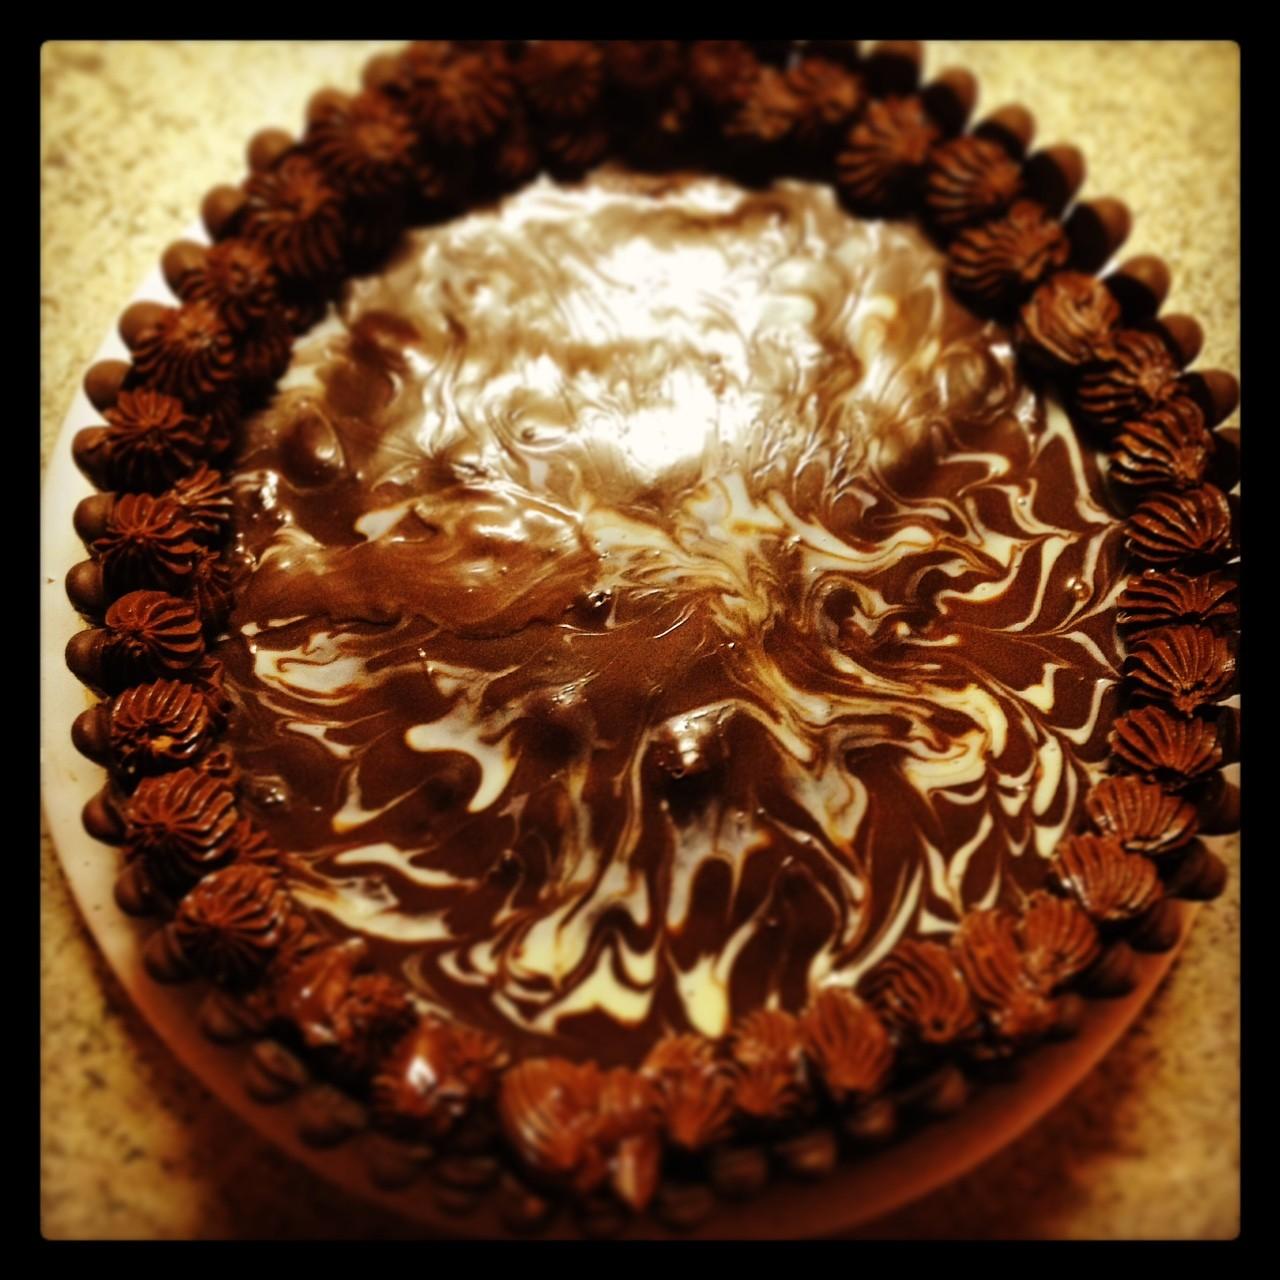 MUD Cake - Torta al Cioccolato